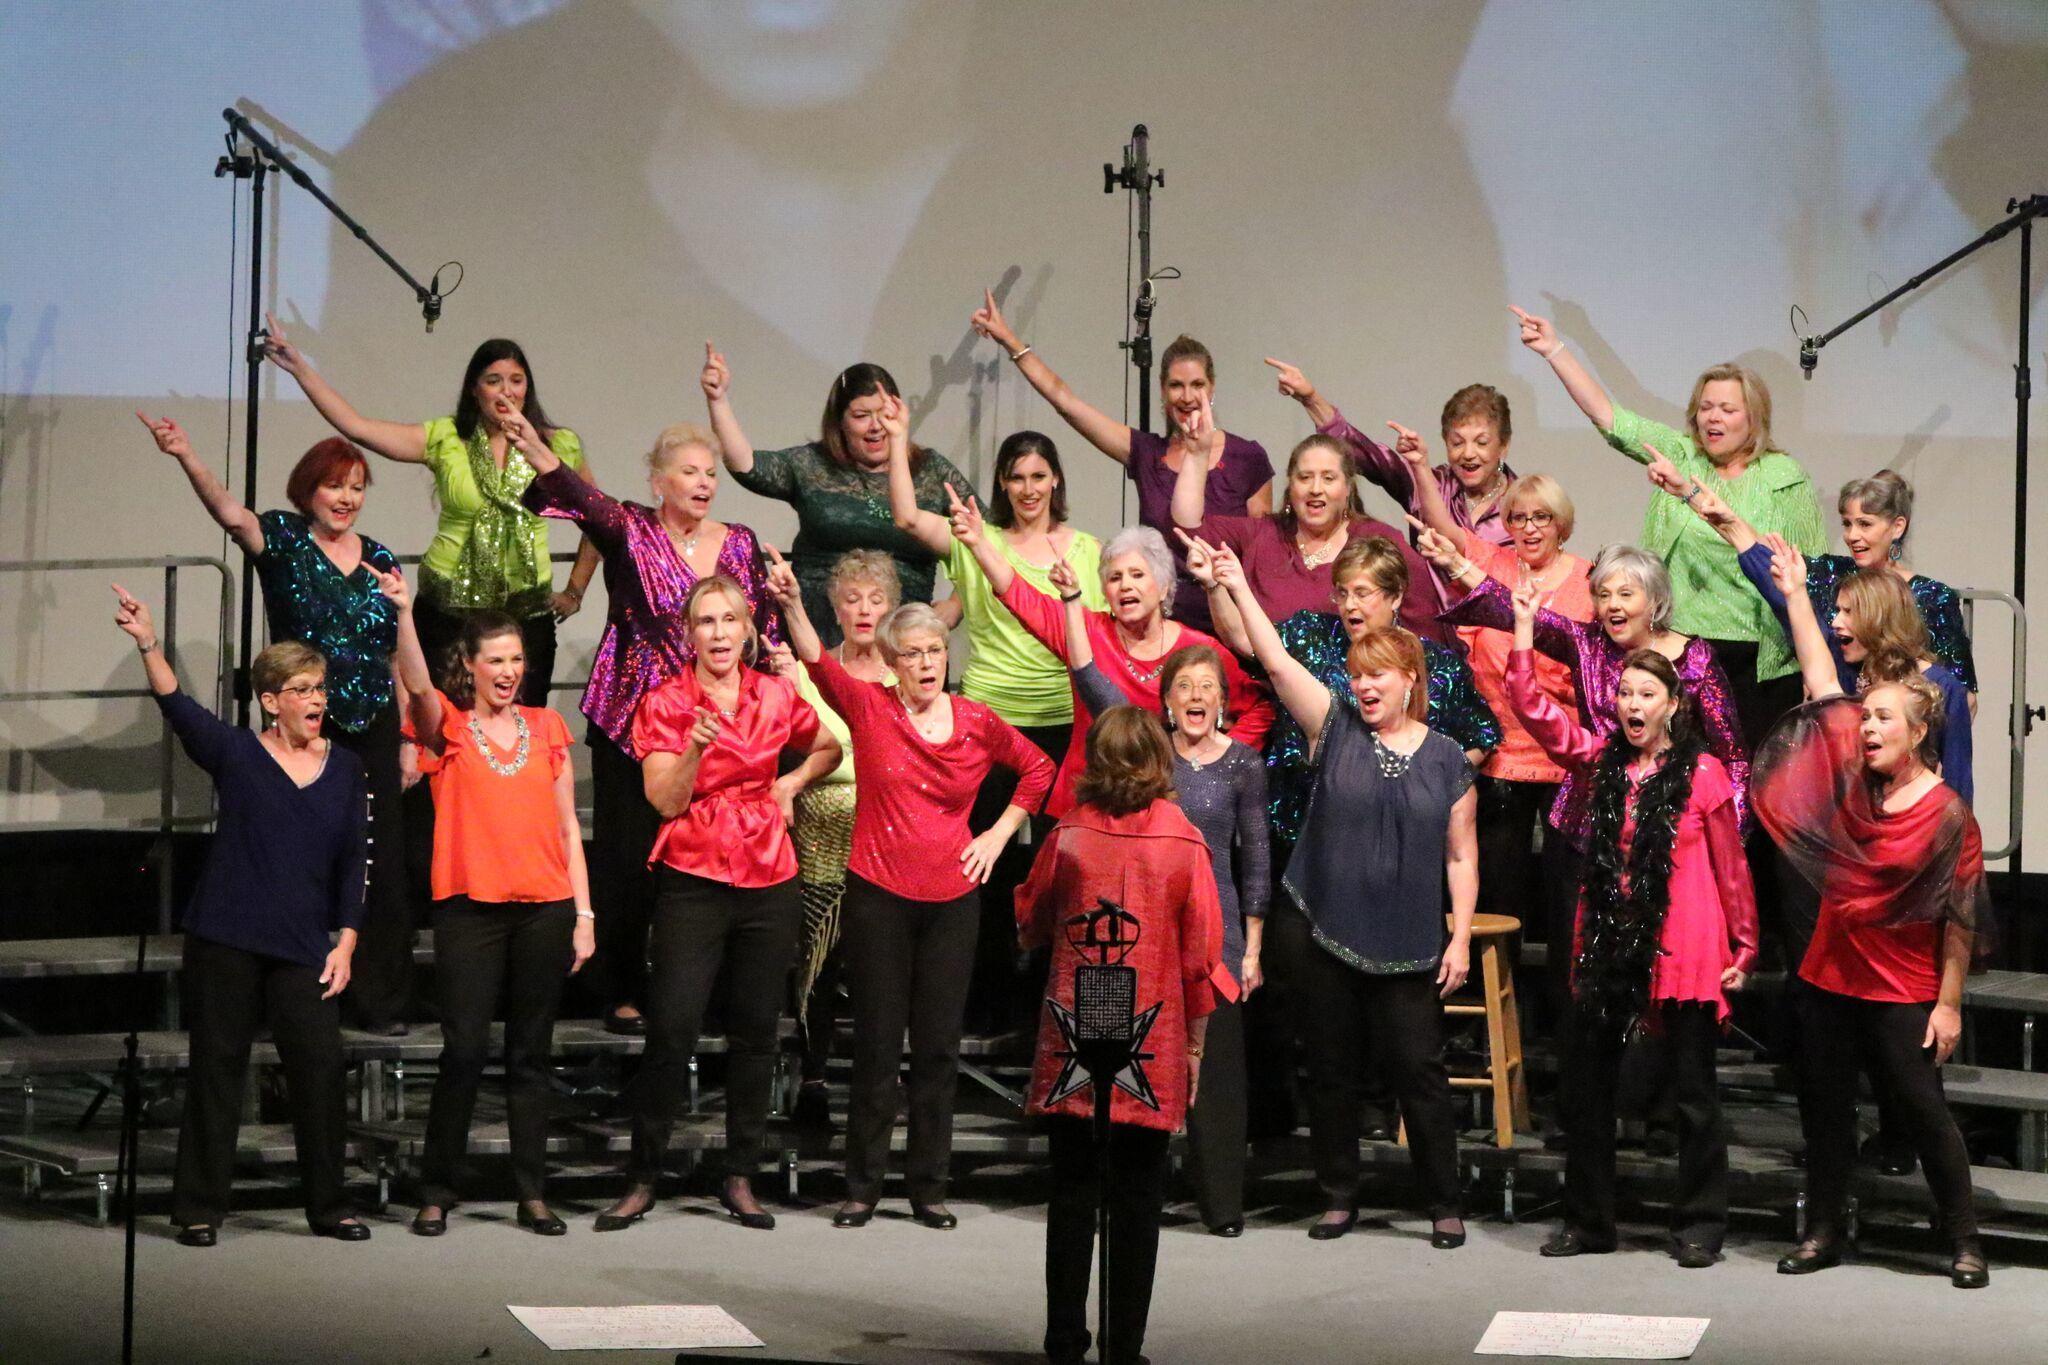 Sing with the RiverOaks Chorus!